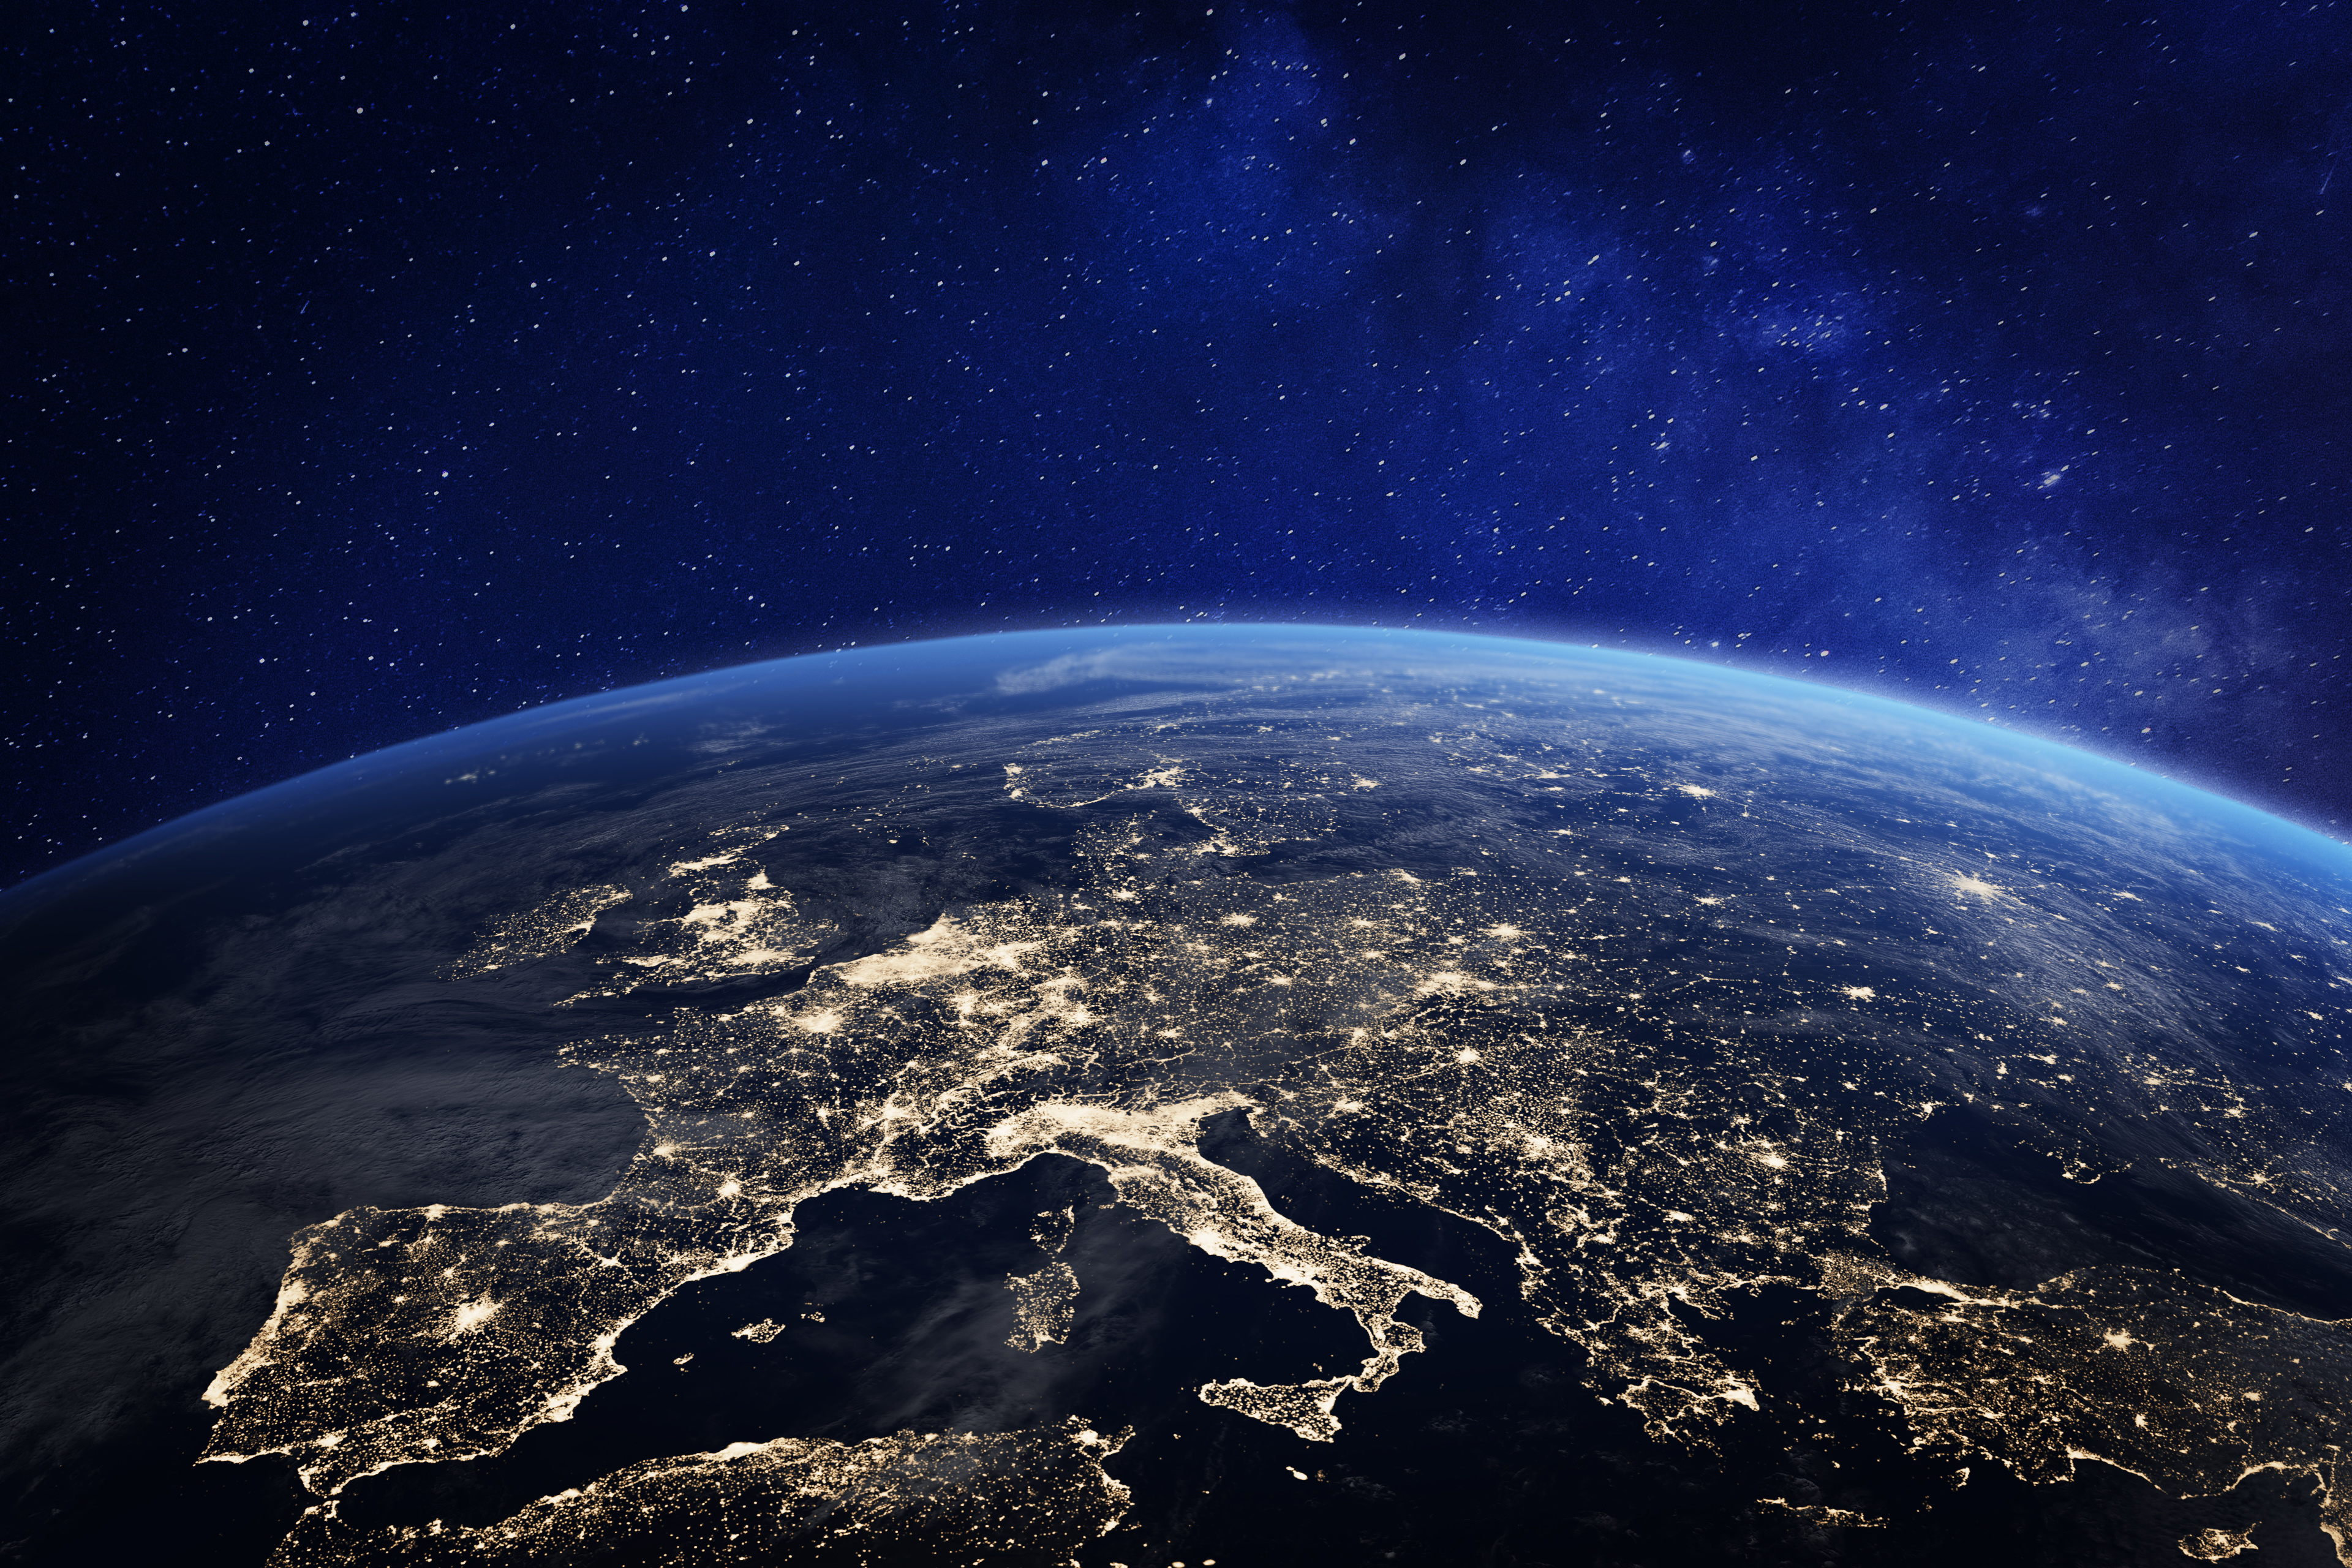 space exploration future human event